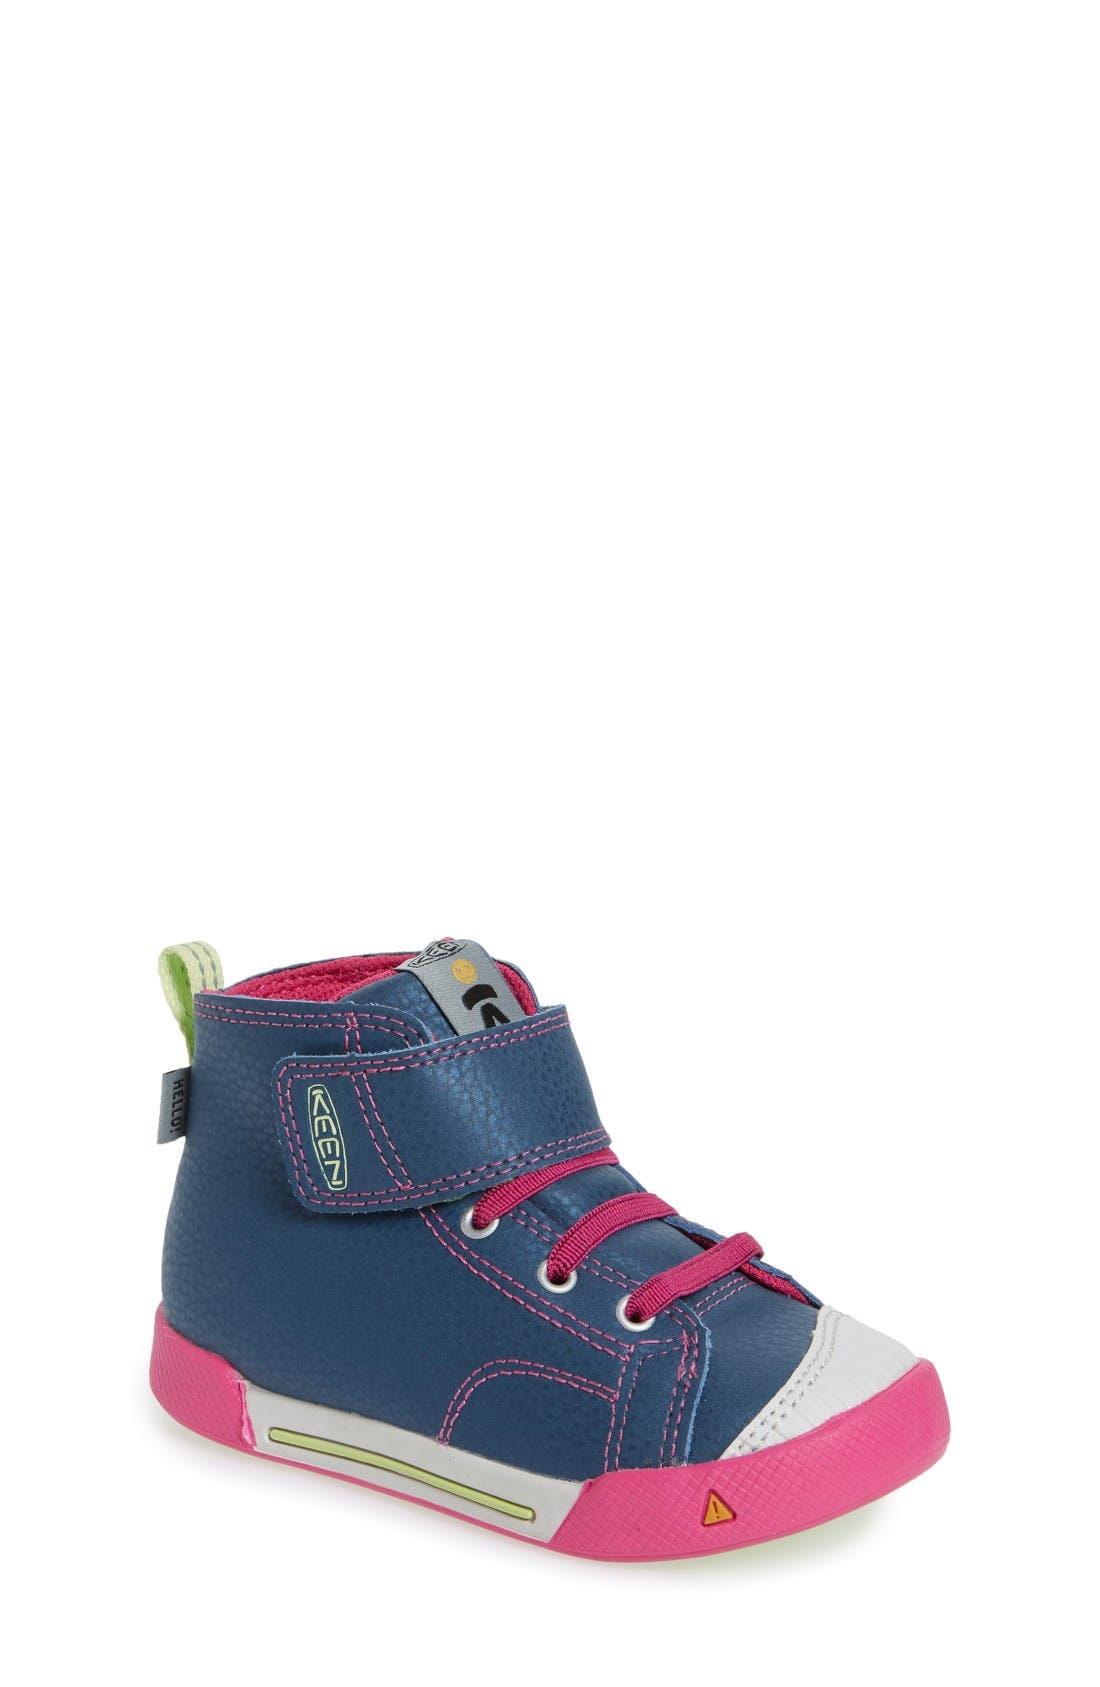 Keen Encanto Scout High Top Sneaker Baby Walker